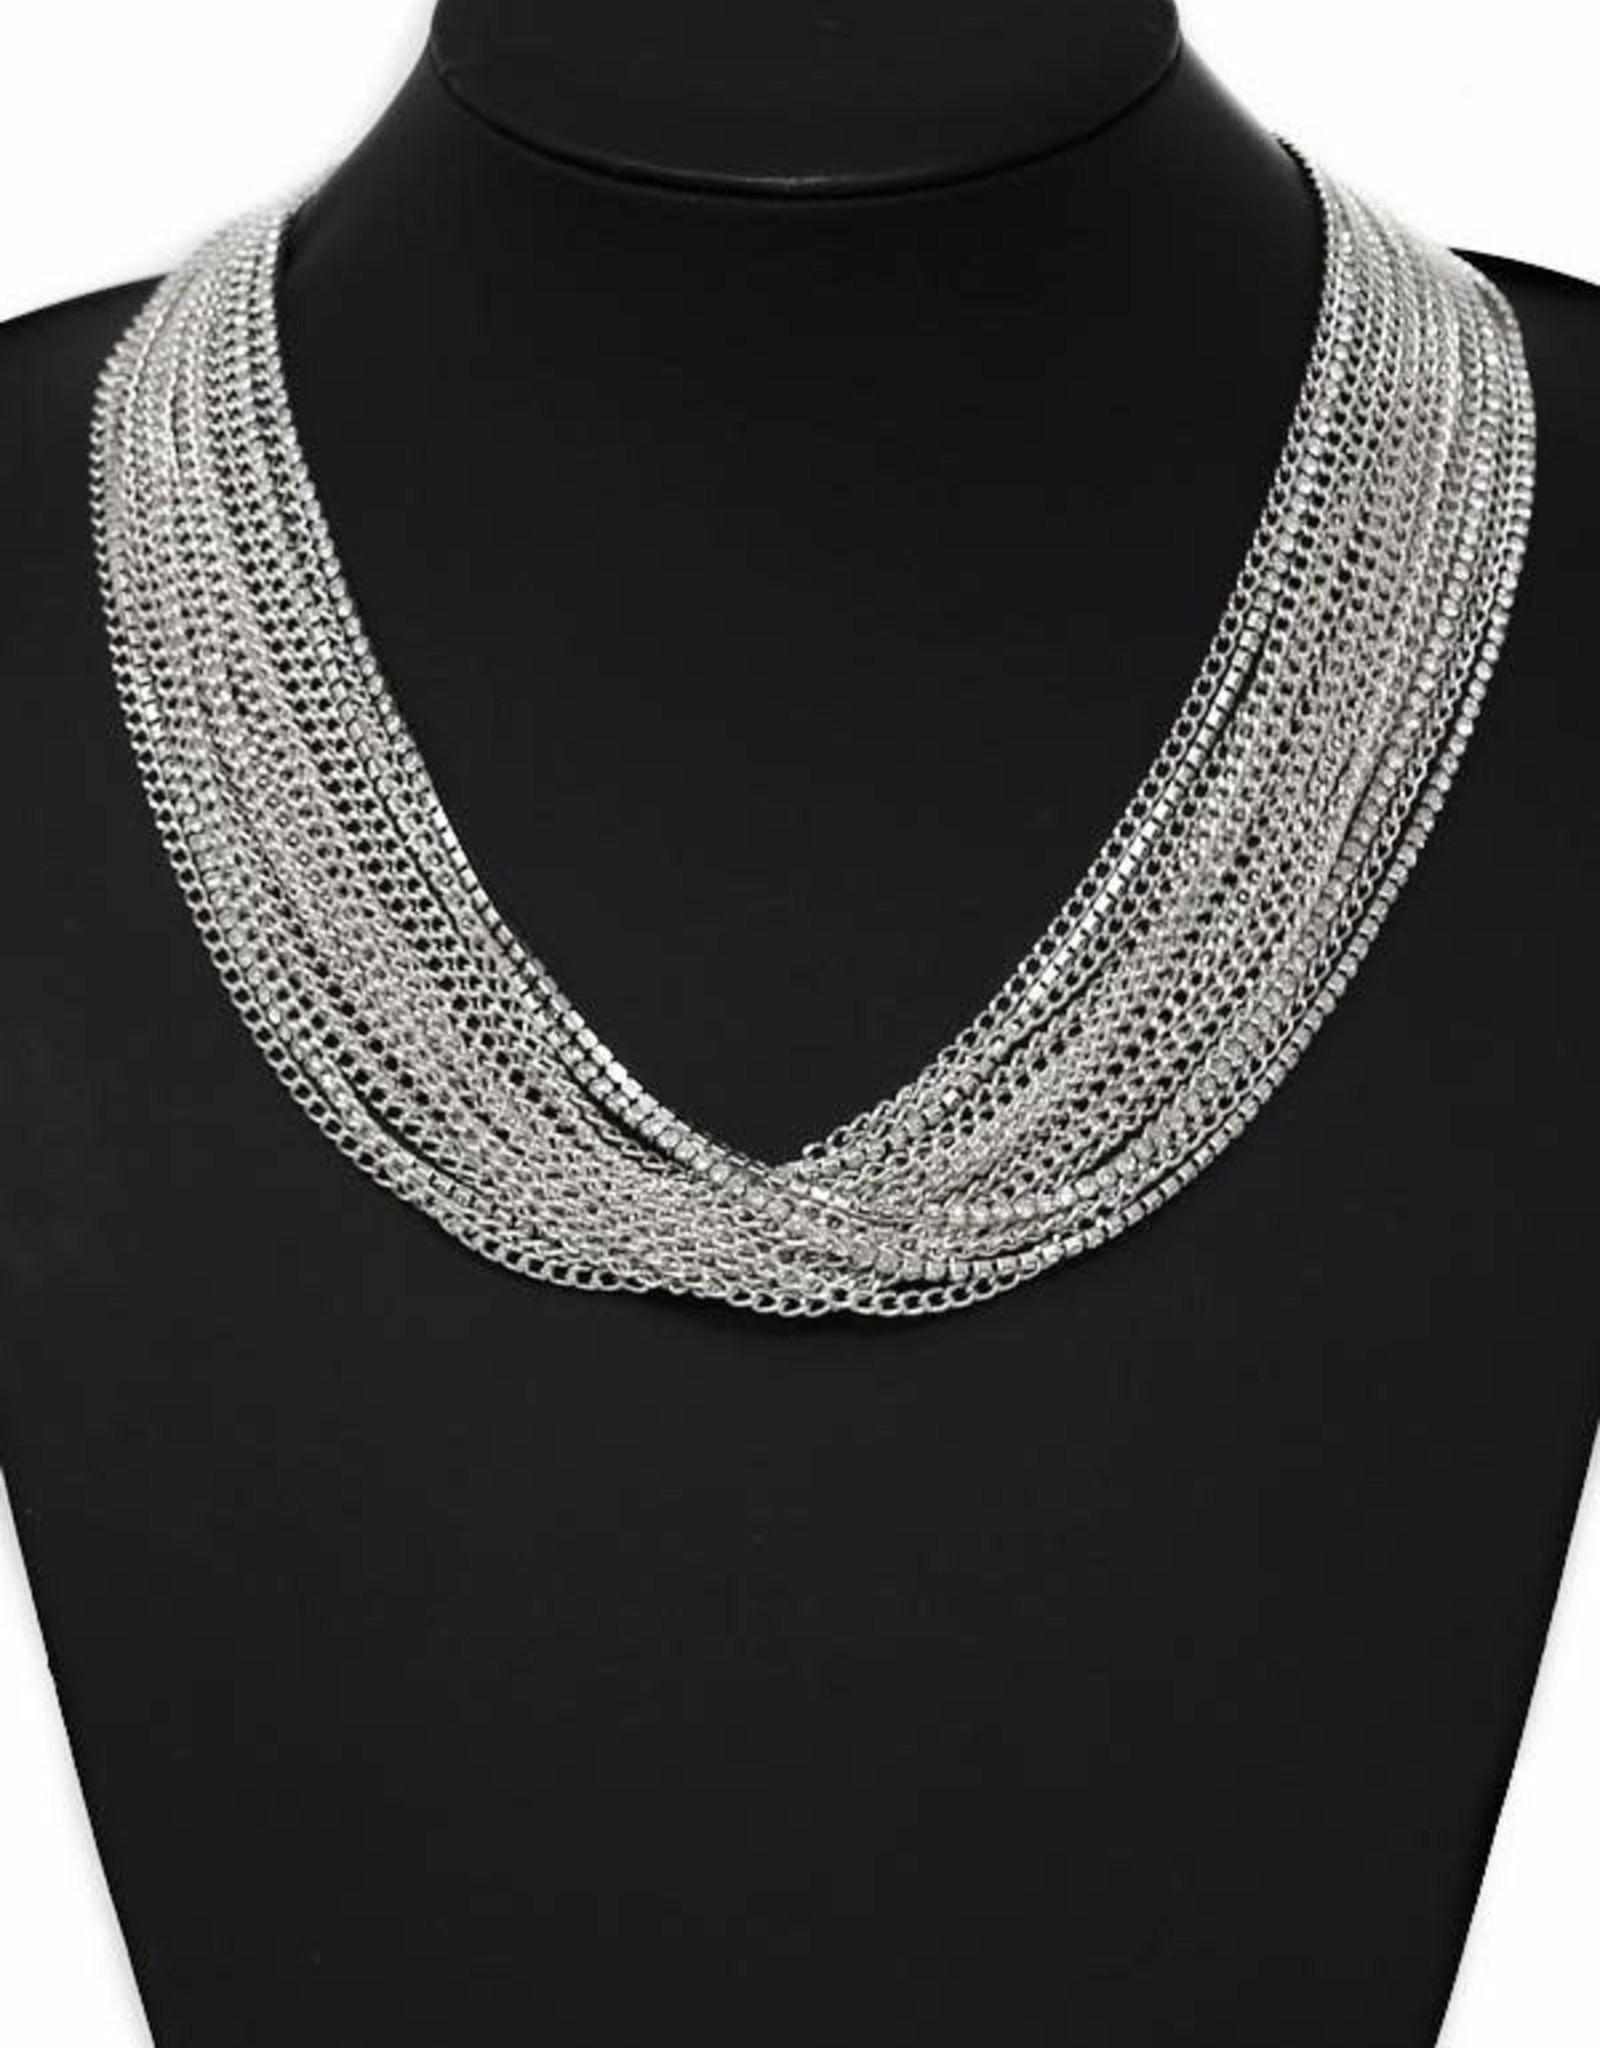 Multi Strand Chain Statement Necklace - Silver